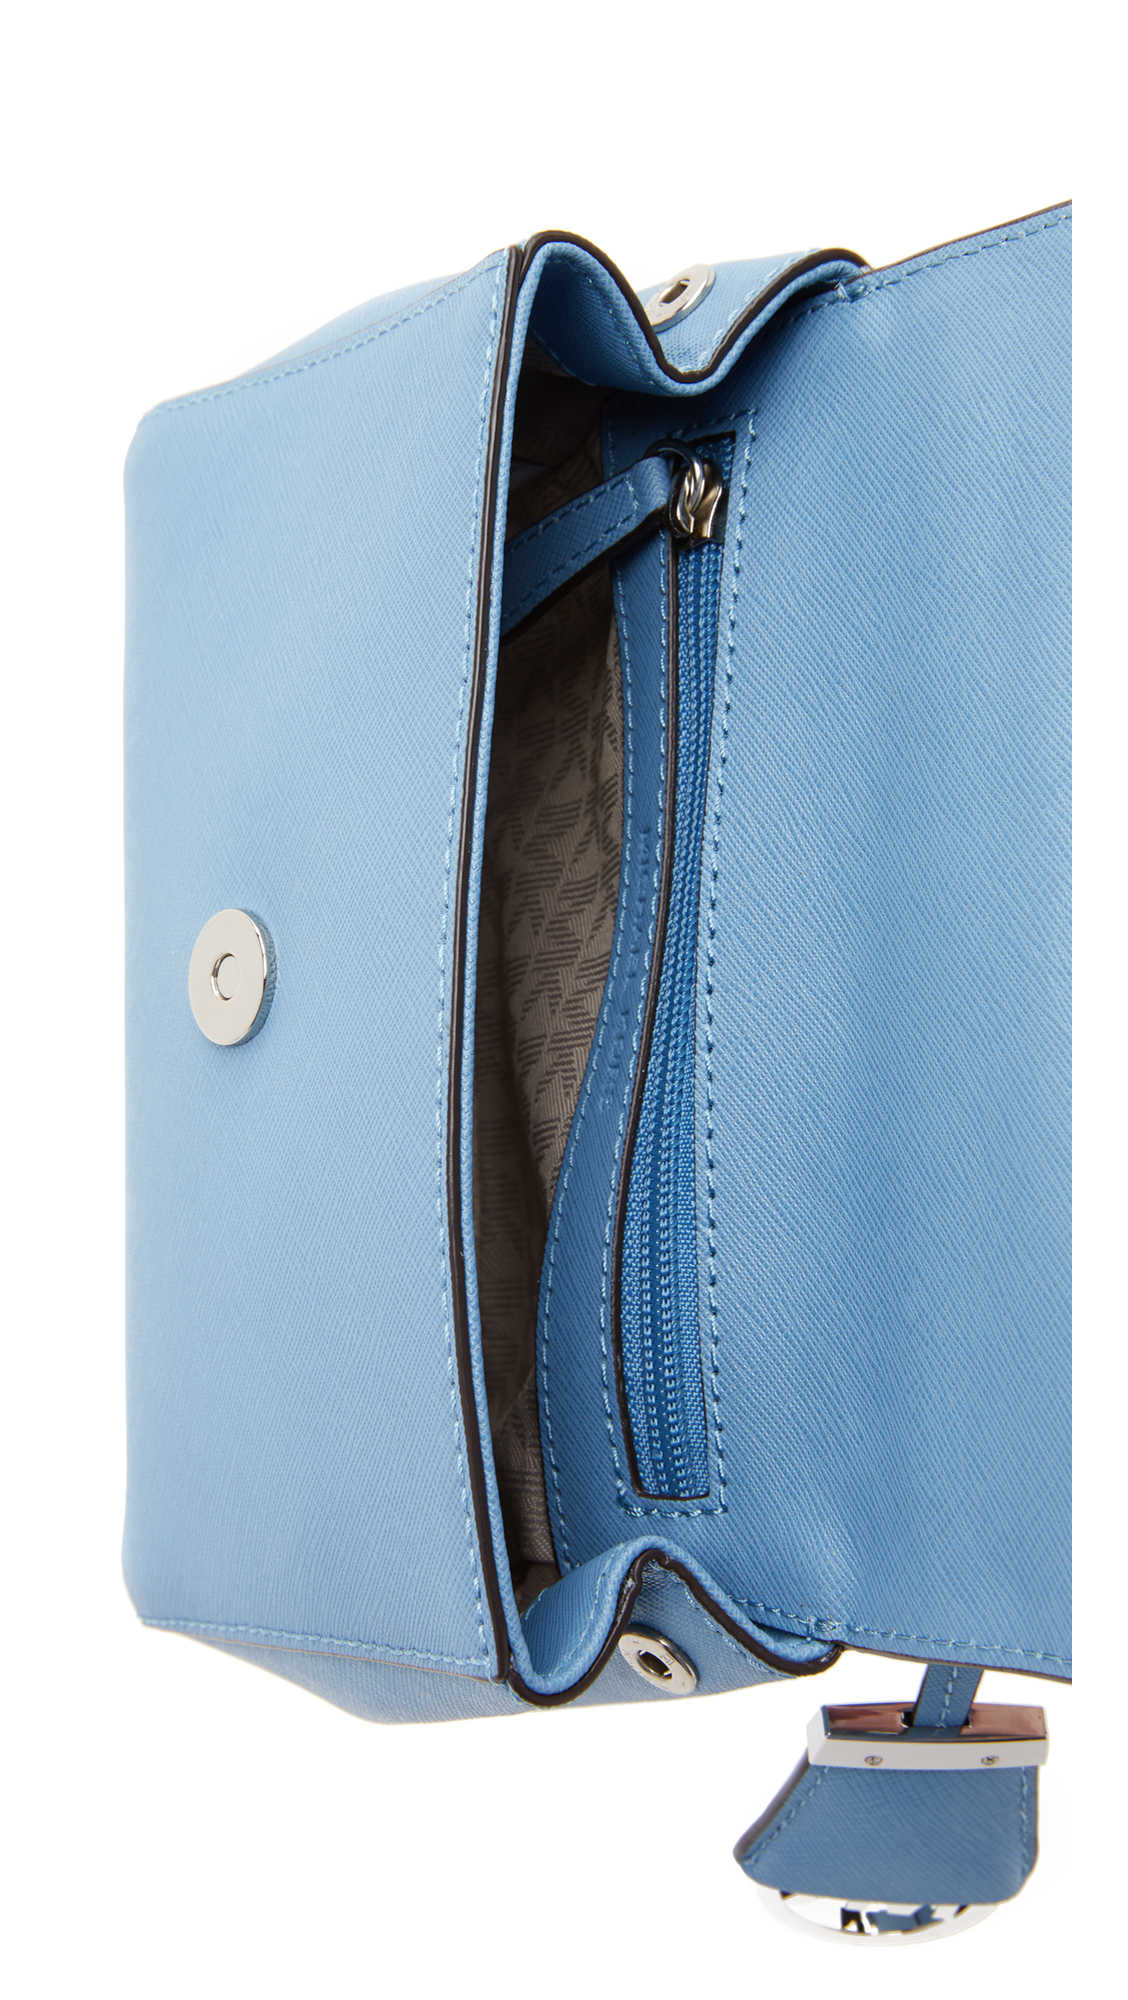 MICHAEL Michael Kors Ava Small Cross Body Bag - Sky in Blue